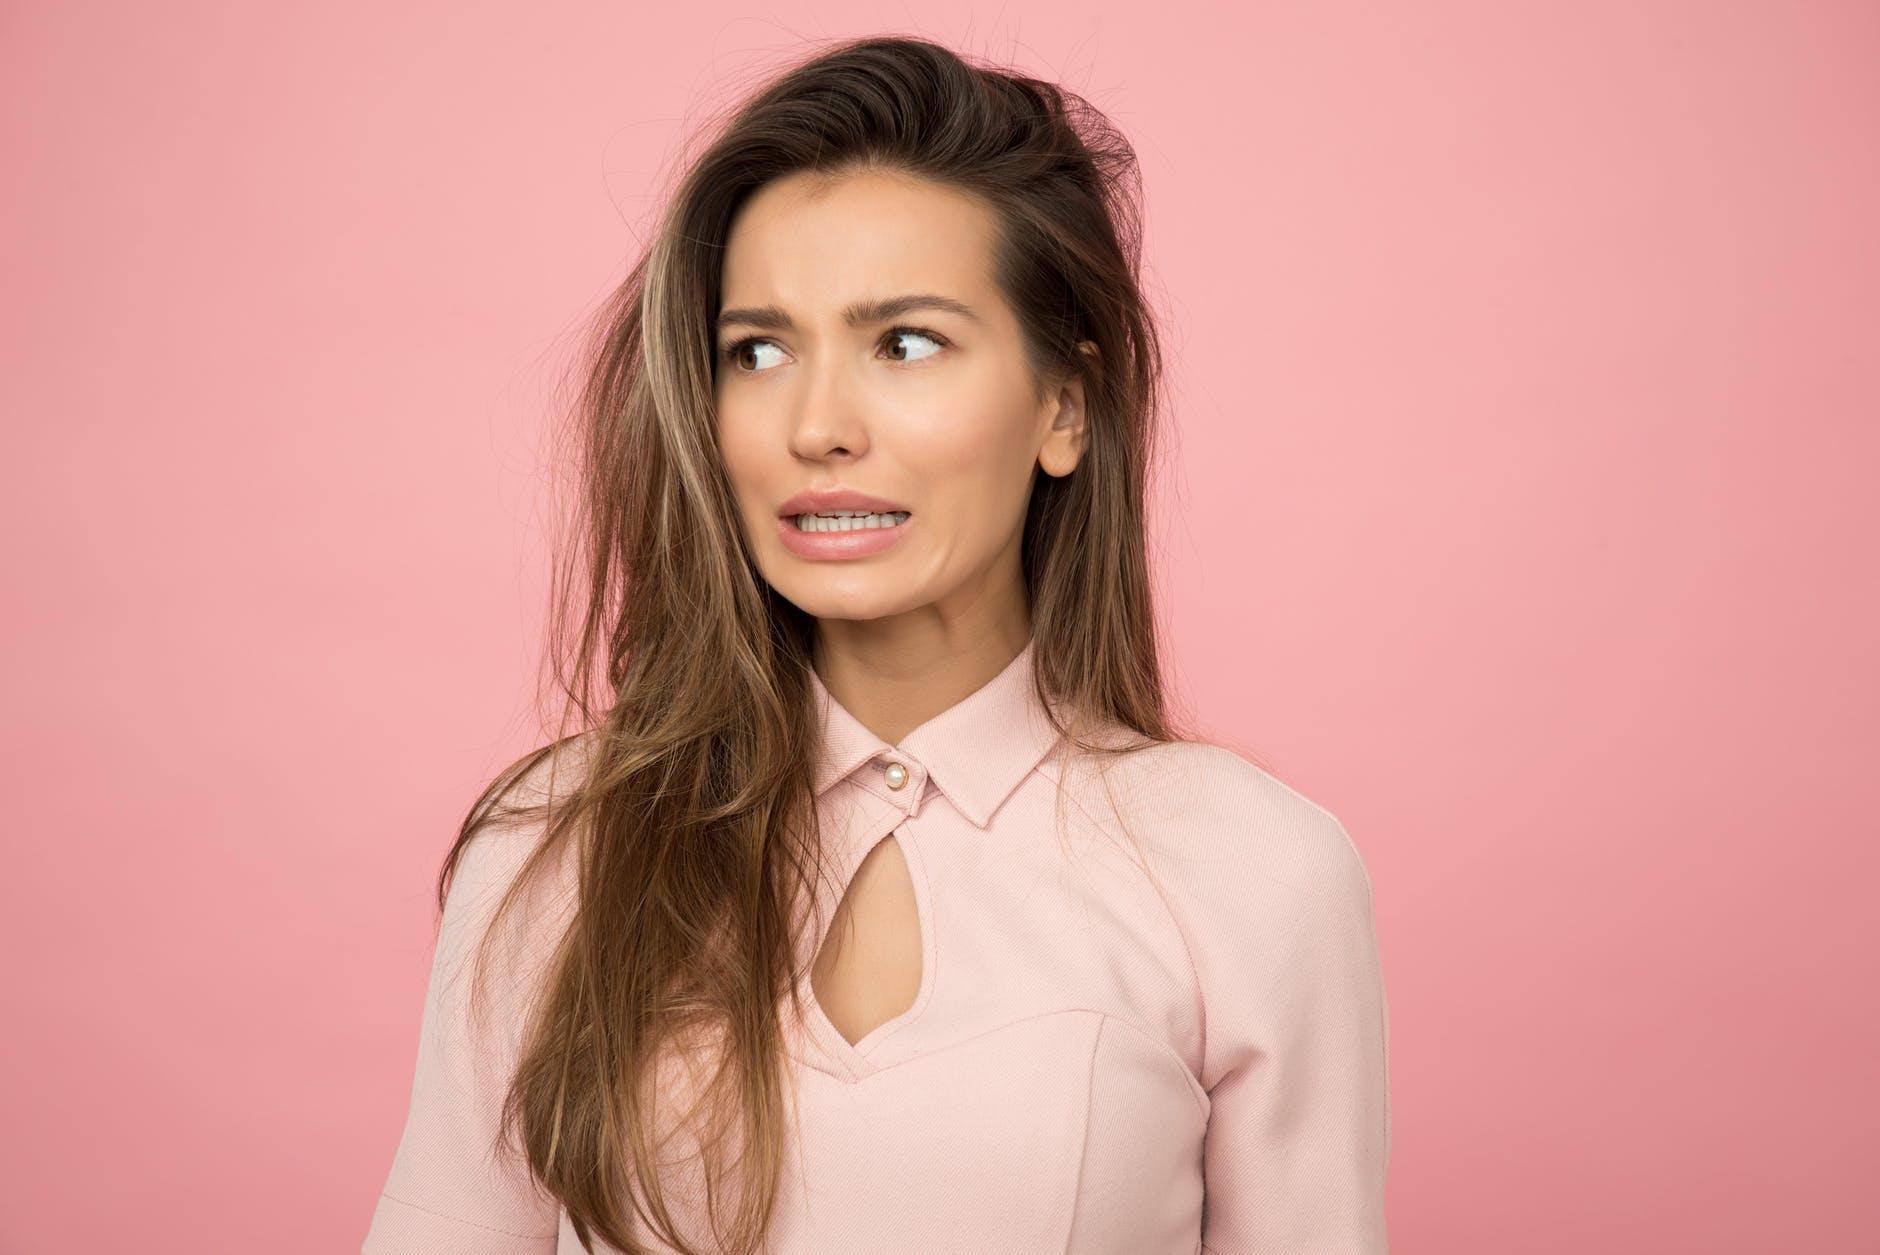 woman wearing pink top